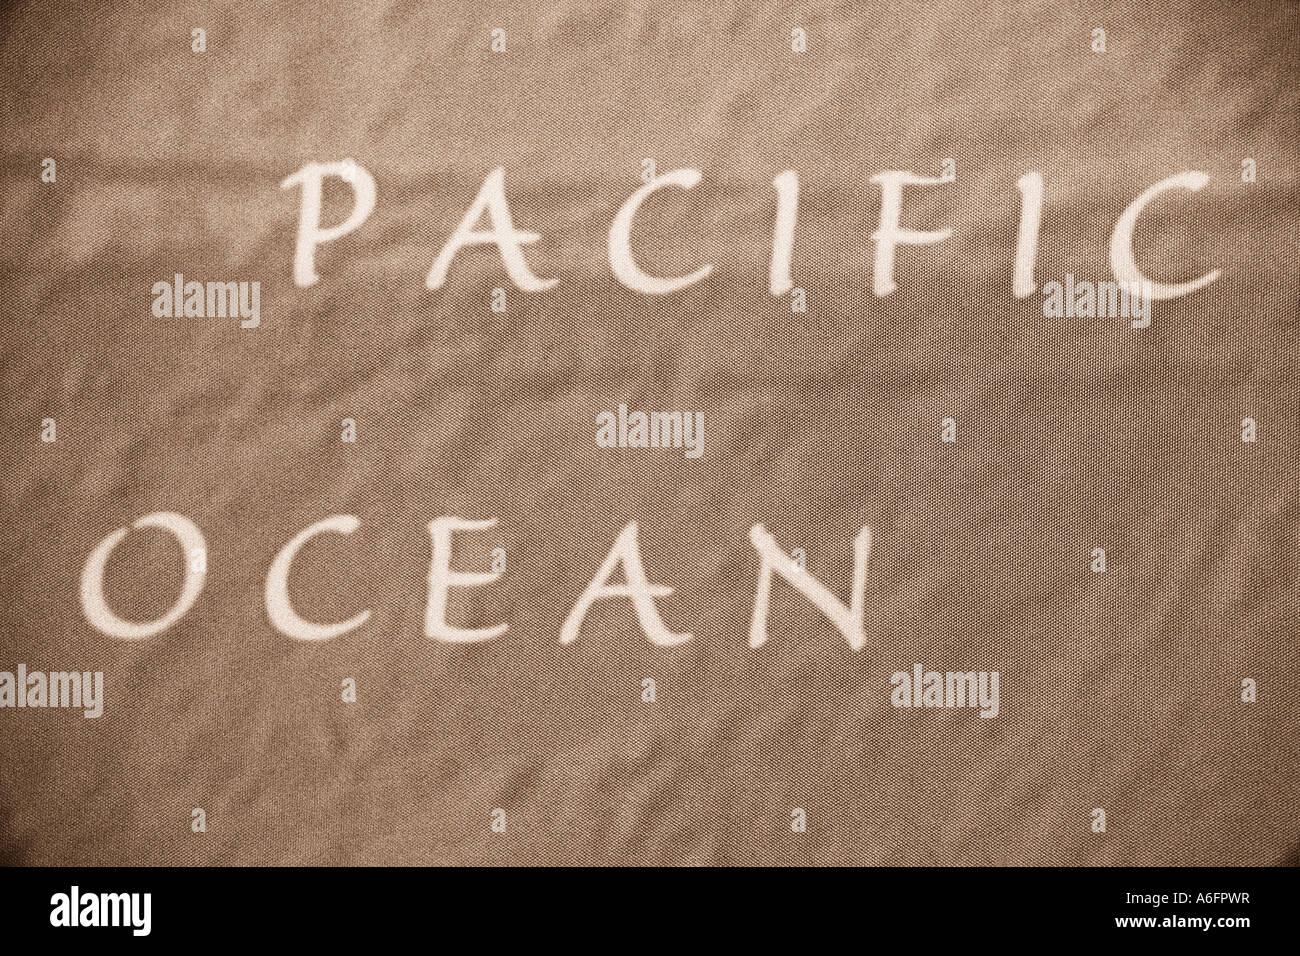 Pacific Ocean - Stock Image